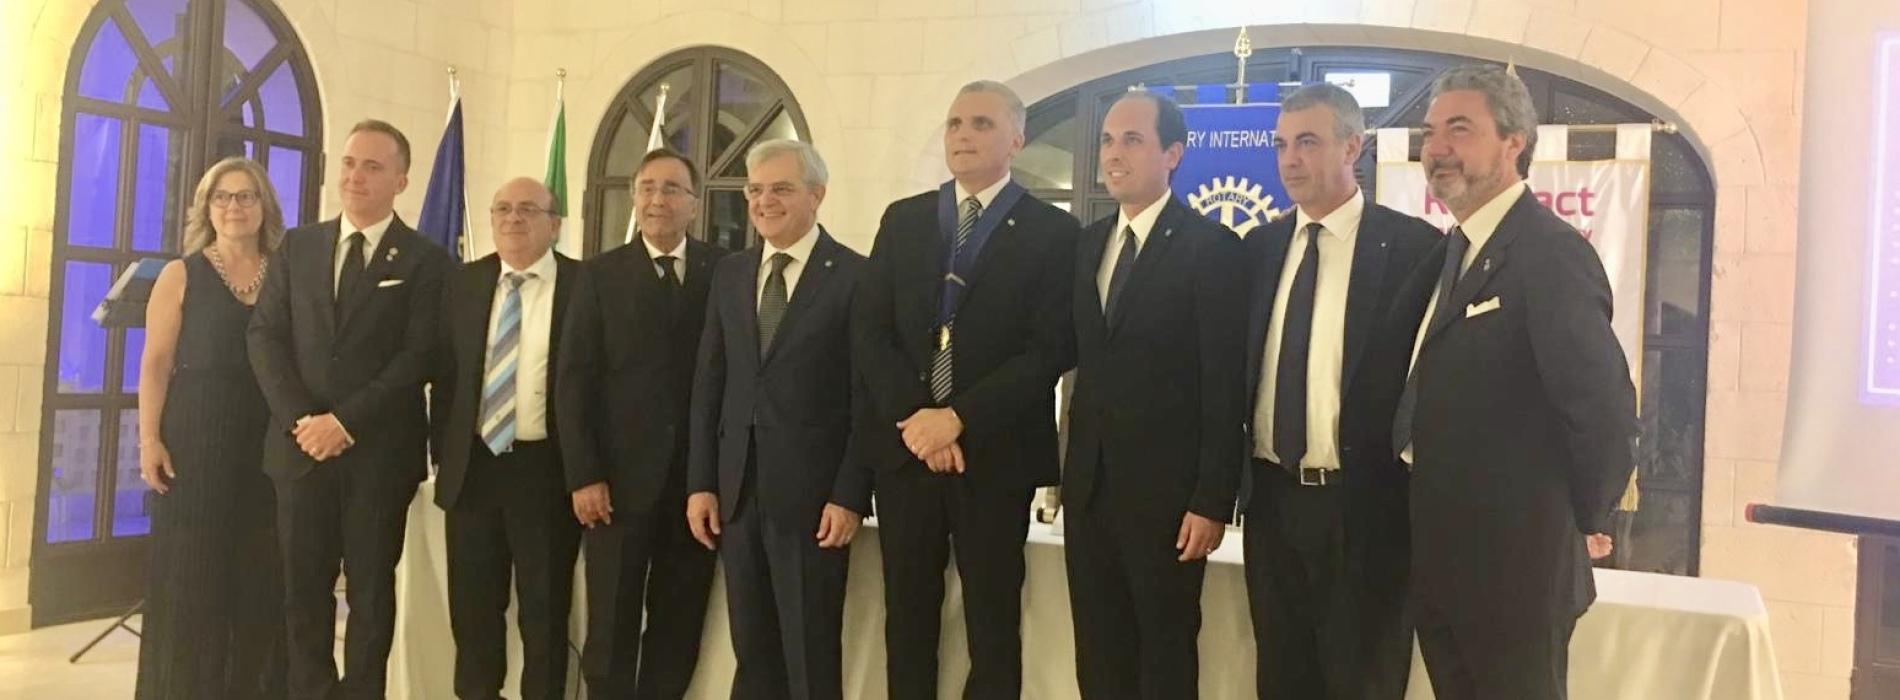 Rotary Club Caserta Reggia. Antonio Nuzzolo neo presidente